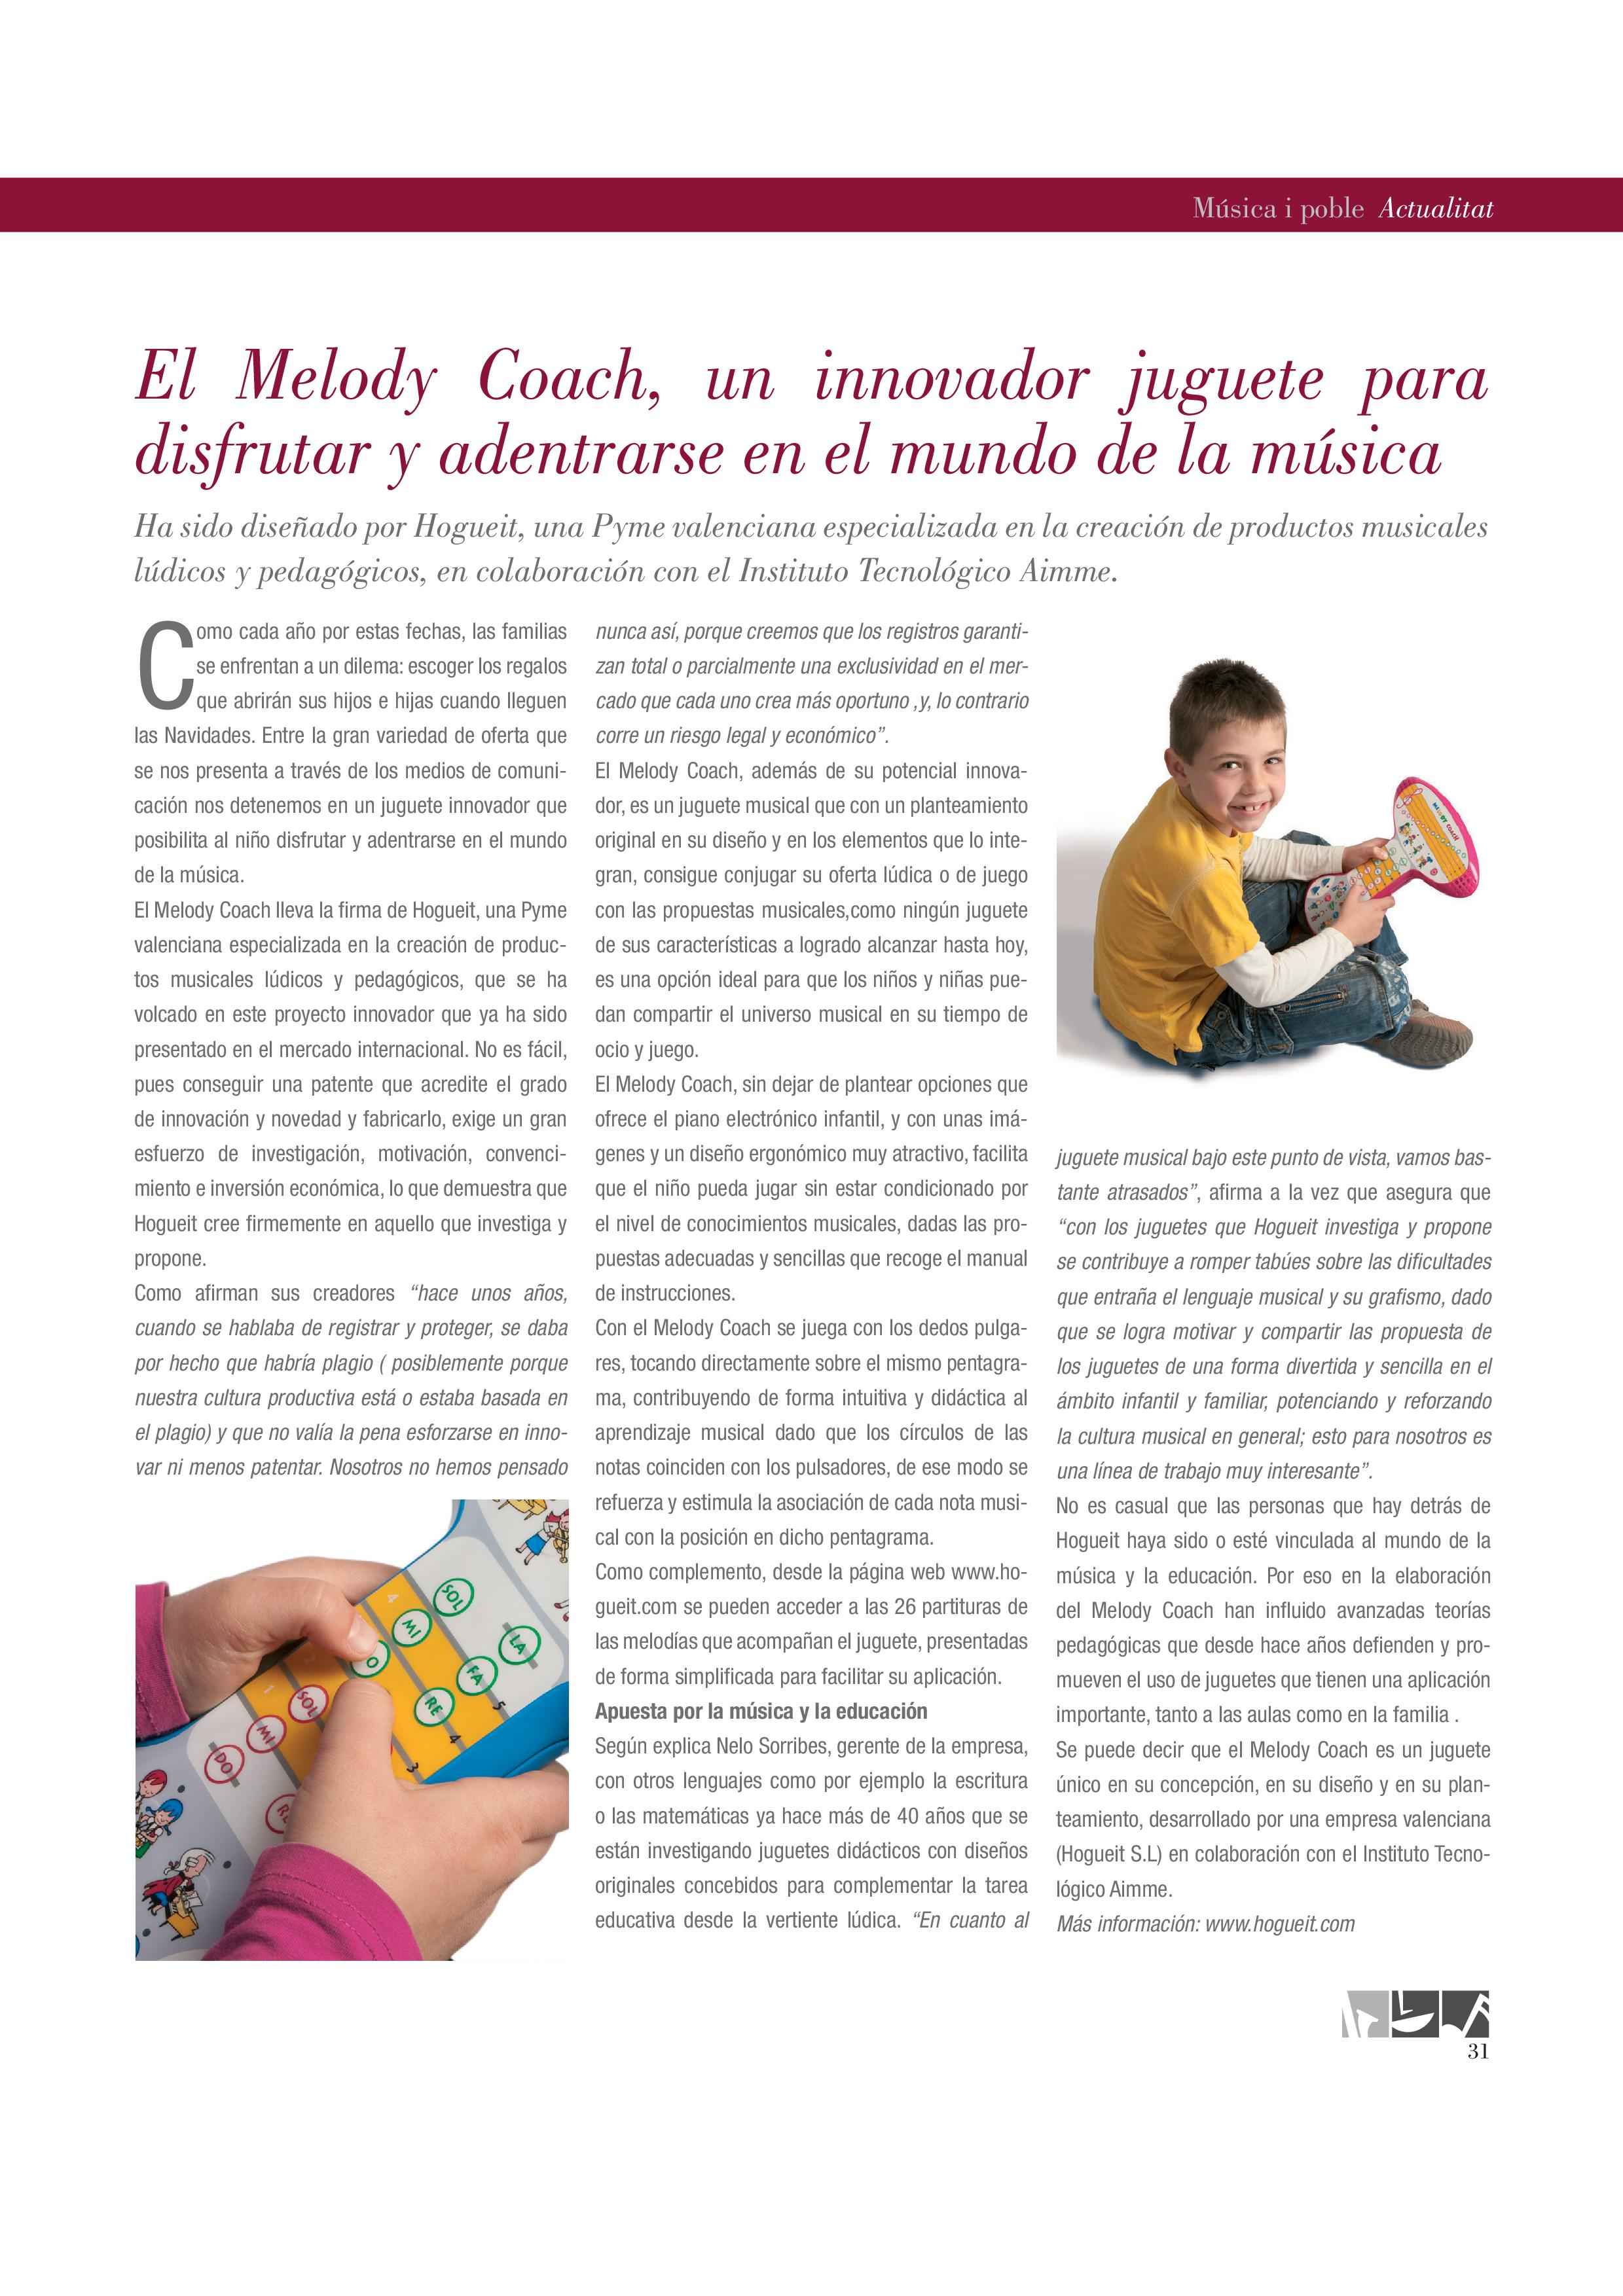 Melody Coach en la Revista MÚSICA I POBLE